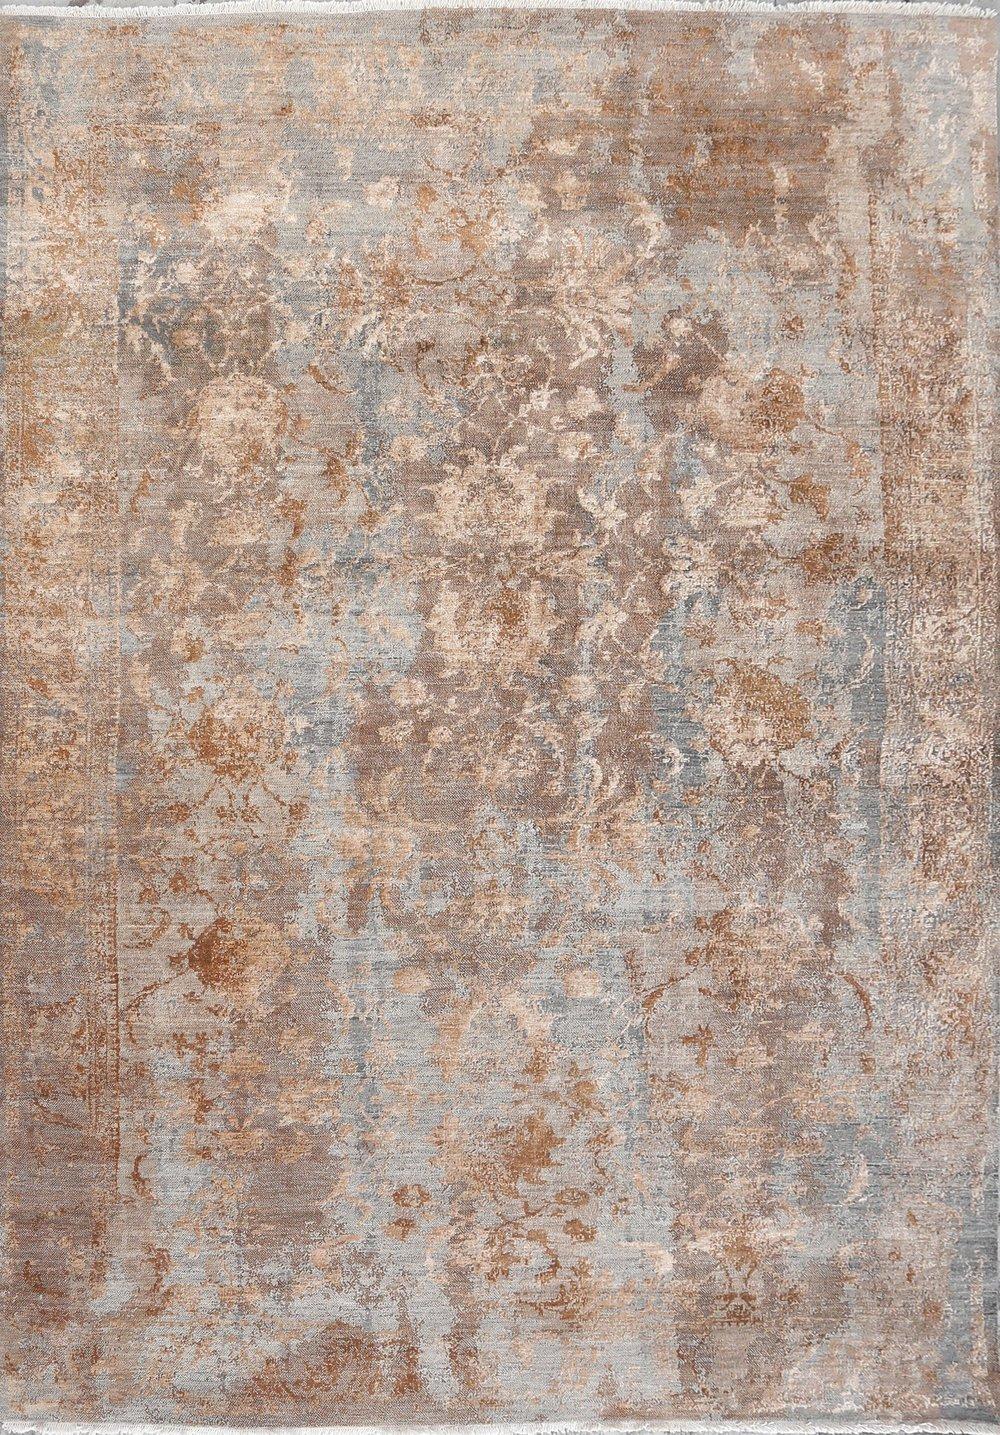 archiproductsNOUVEAU-ORIENT-NAGARE-BEIGE-IVORY-EBRU-235628-rel4f2ab17f.jpg